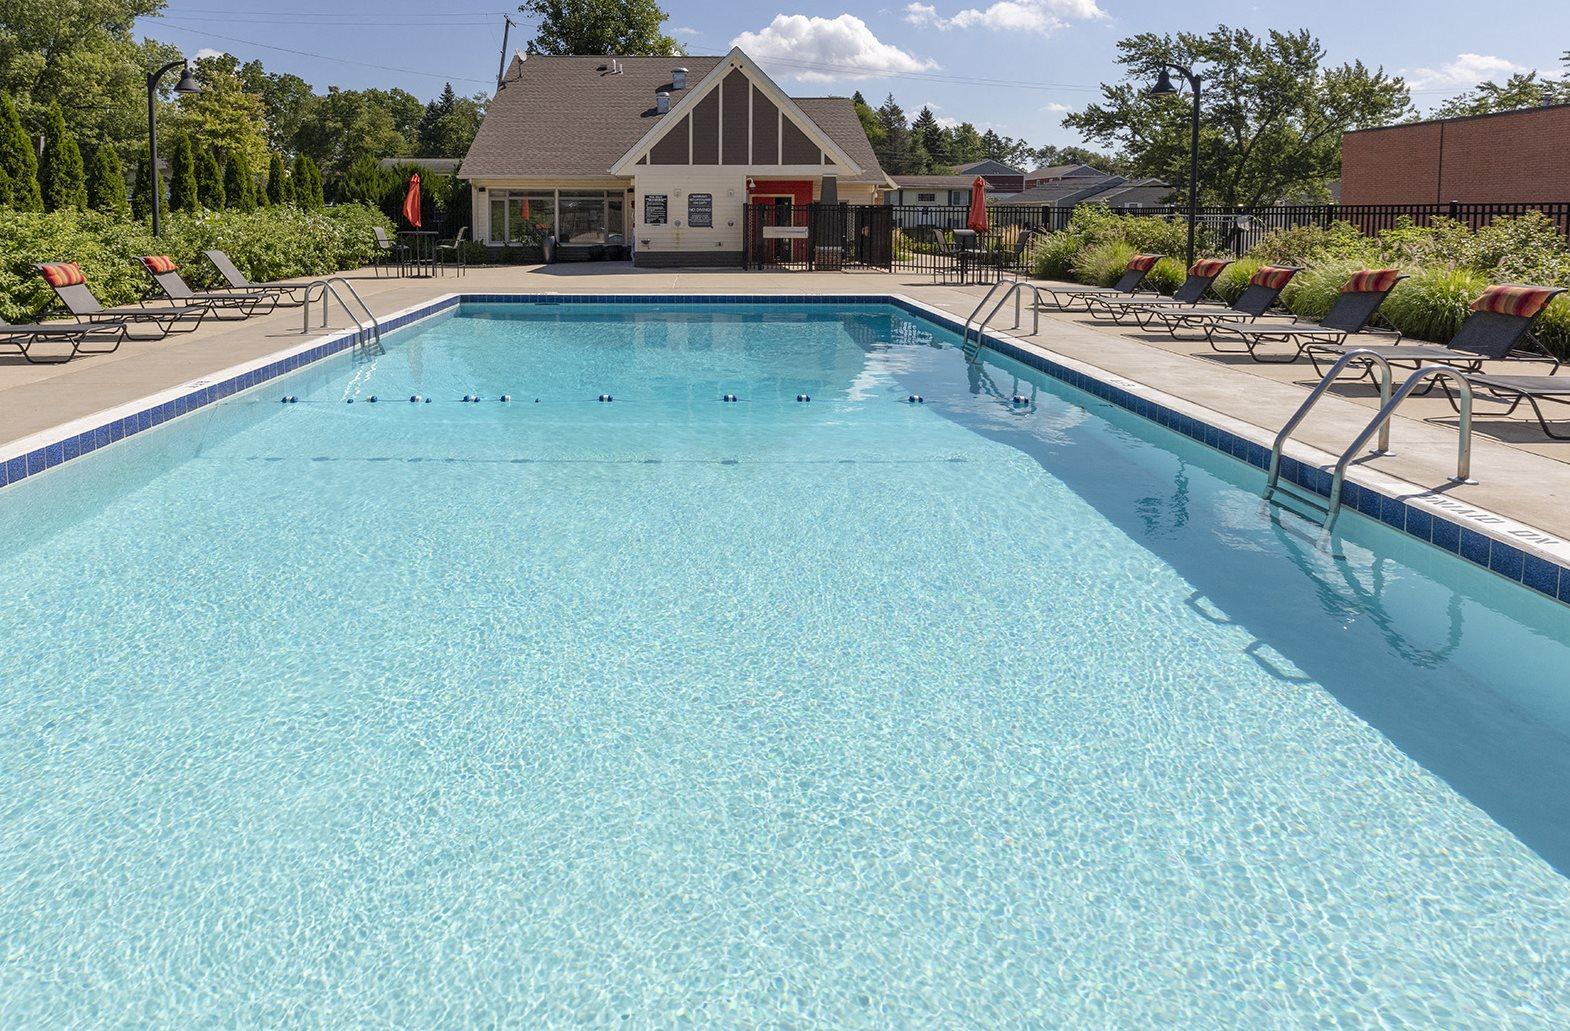 Pool and Sundeck at Apartments in Kalamazoo MI